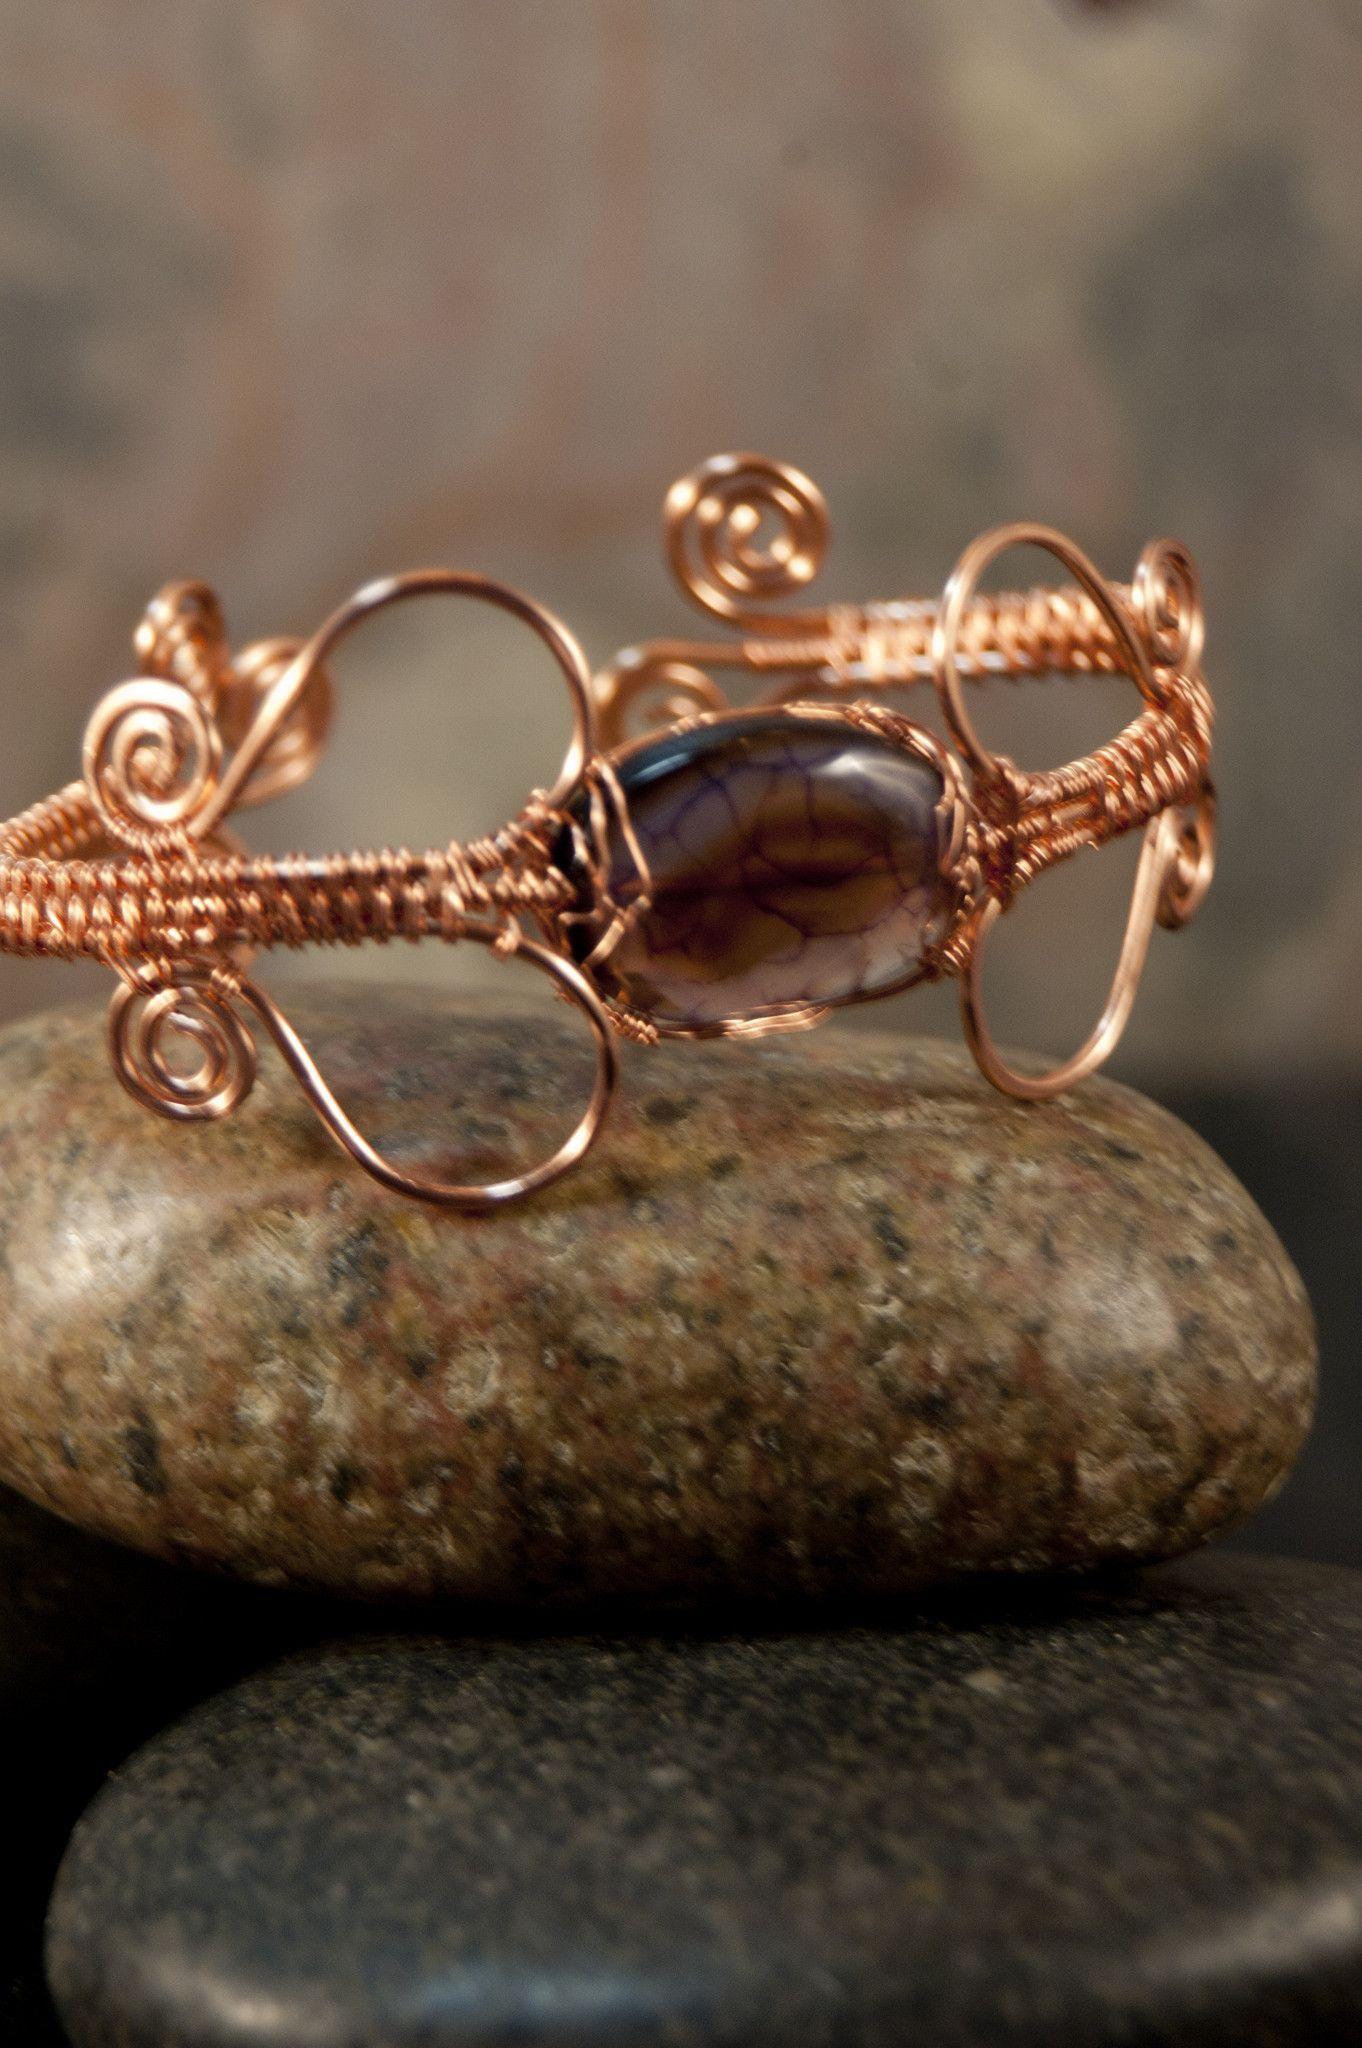 Dragon Vein Agate Wire Woven Copper Bracelet - Simply Unique Jewelry ...